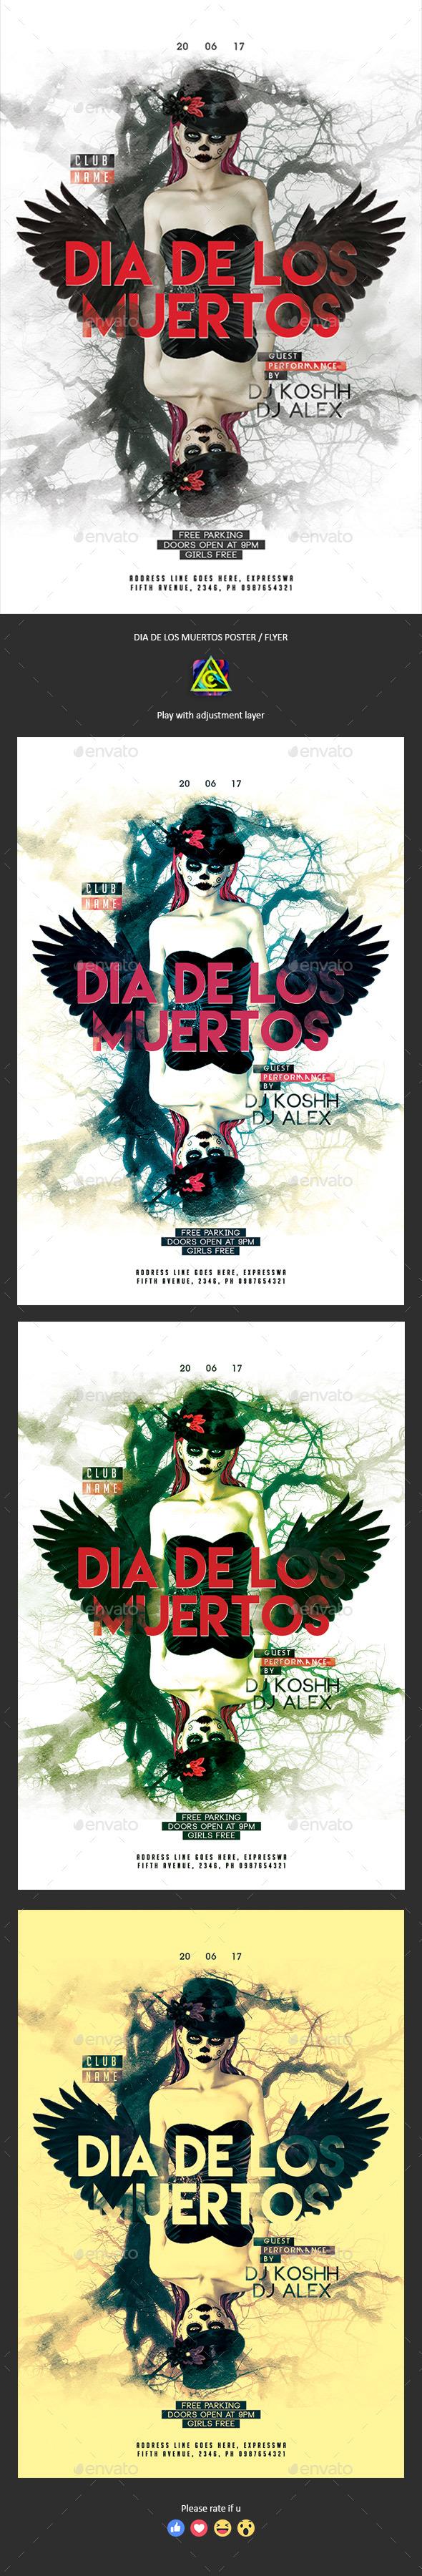 Dia De Los Muertos Party Poster / Flyer - Clubs & Parties Events